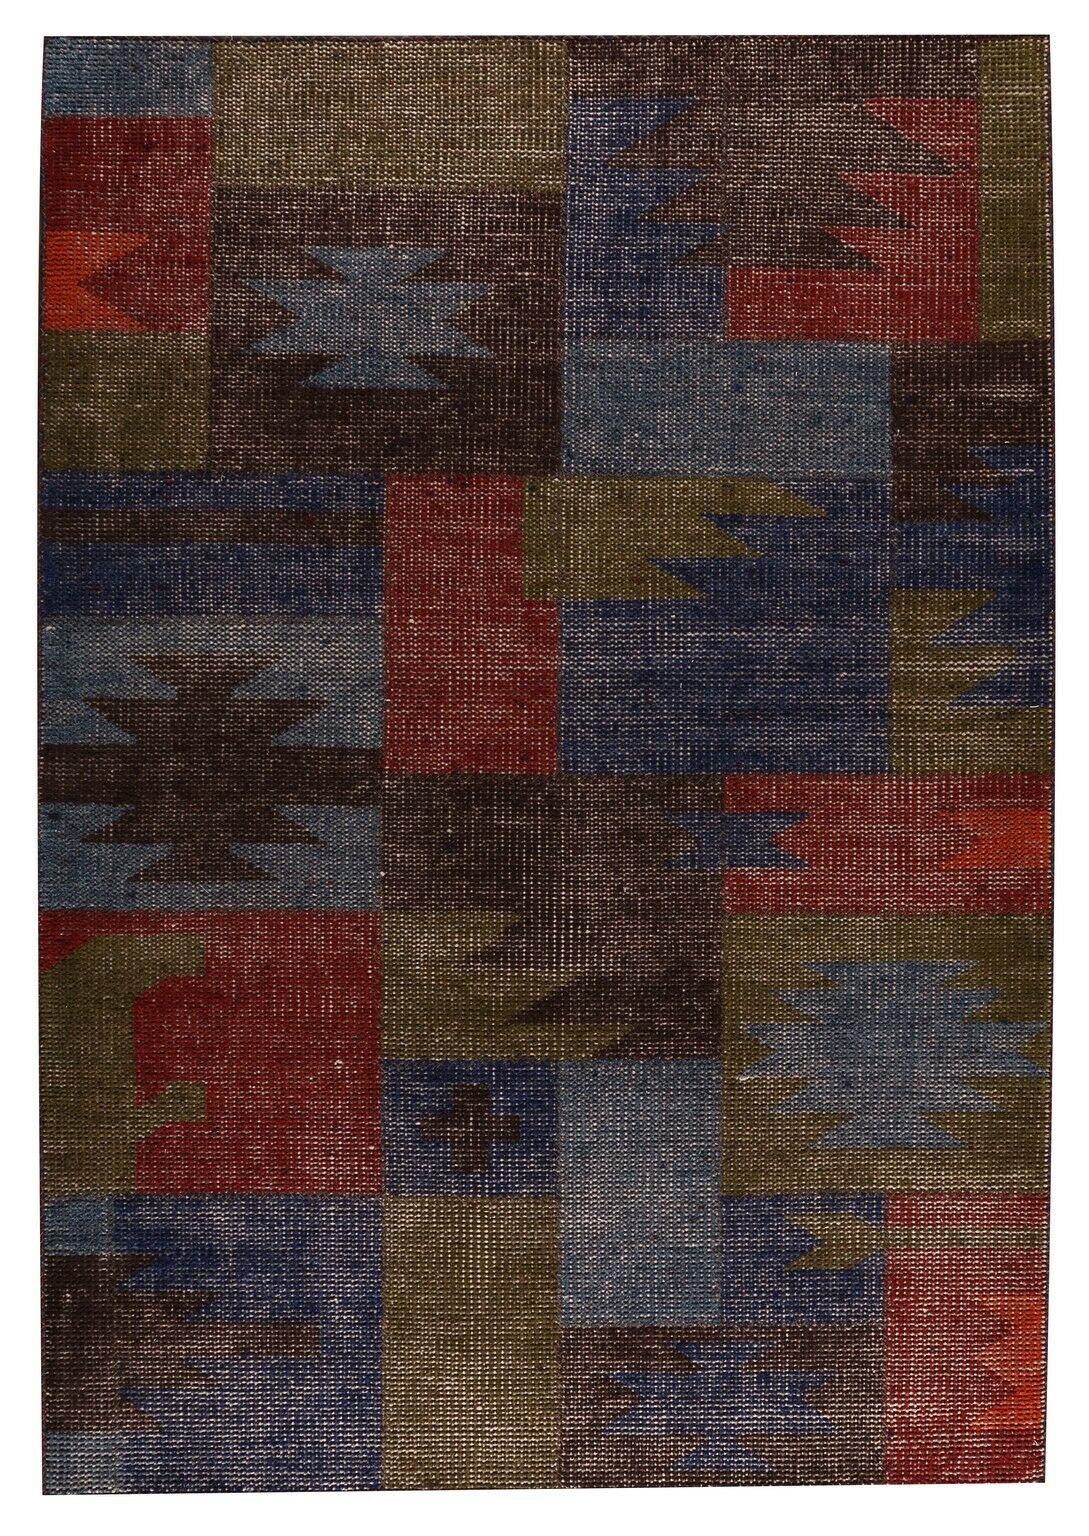 Lina classic Hand-Woven Brown/Gray Area Rug Rug Size: 5'6